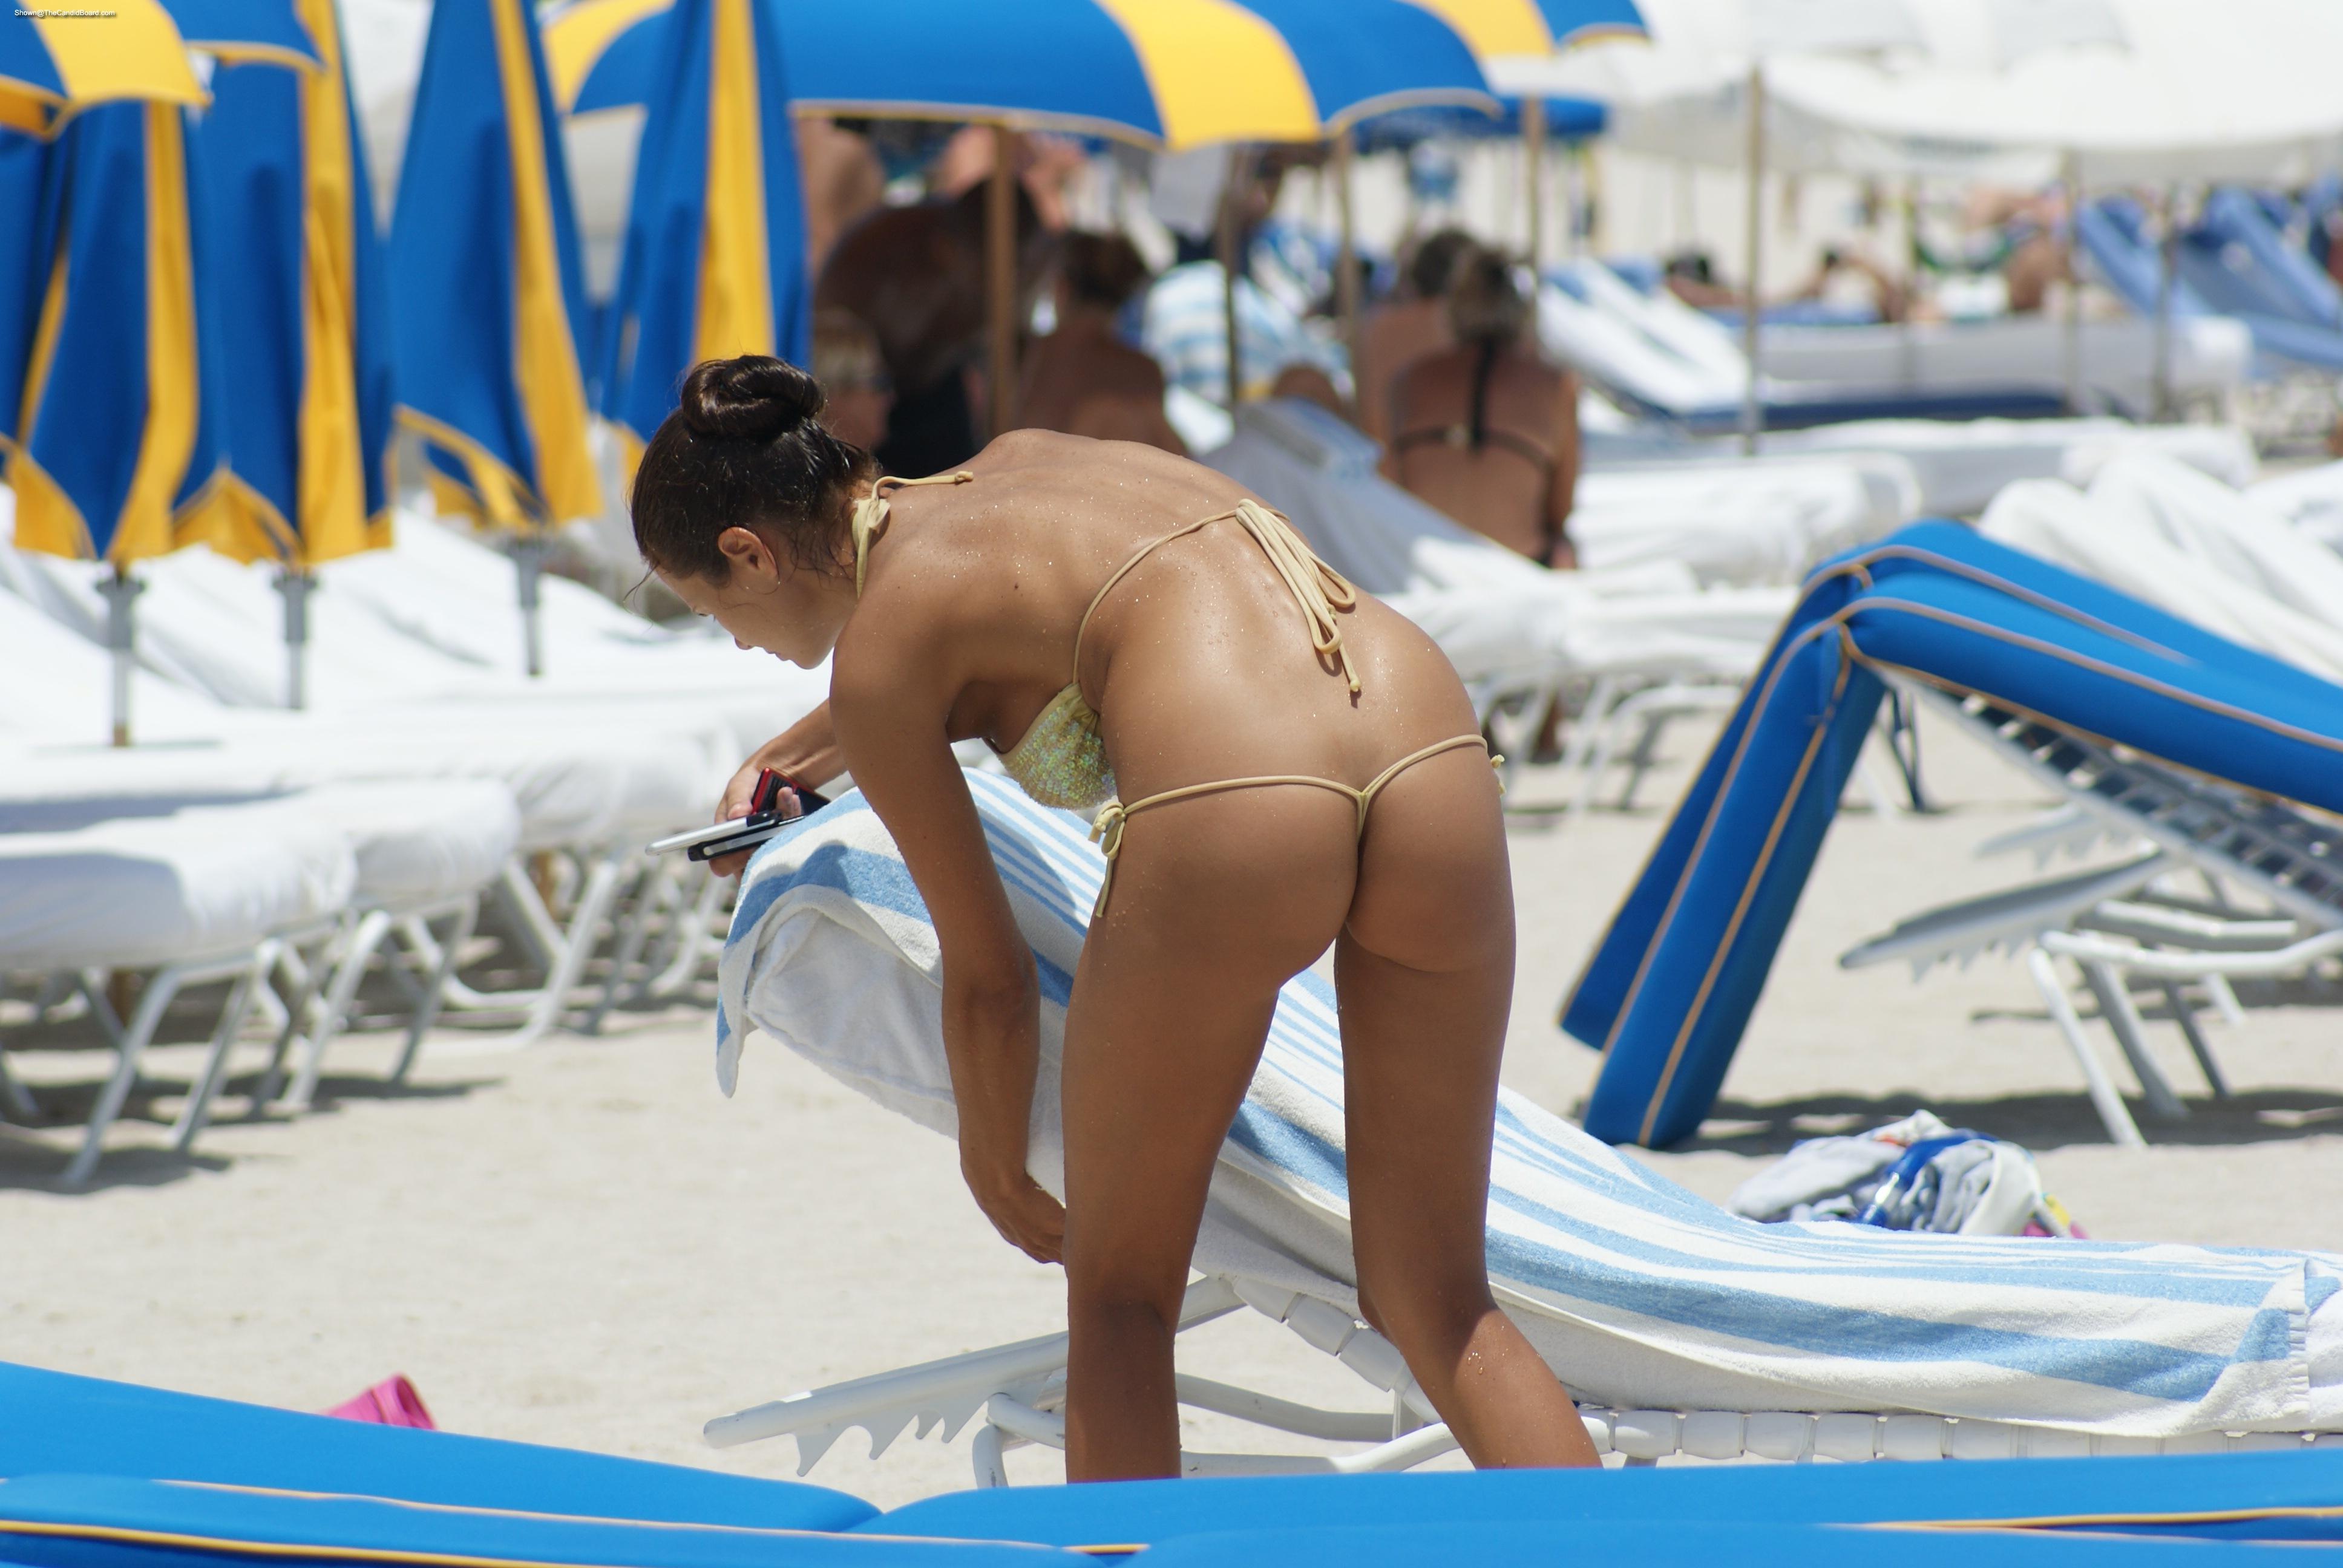 String bikini public